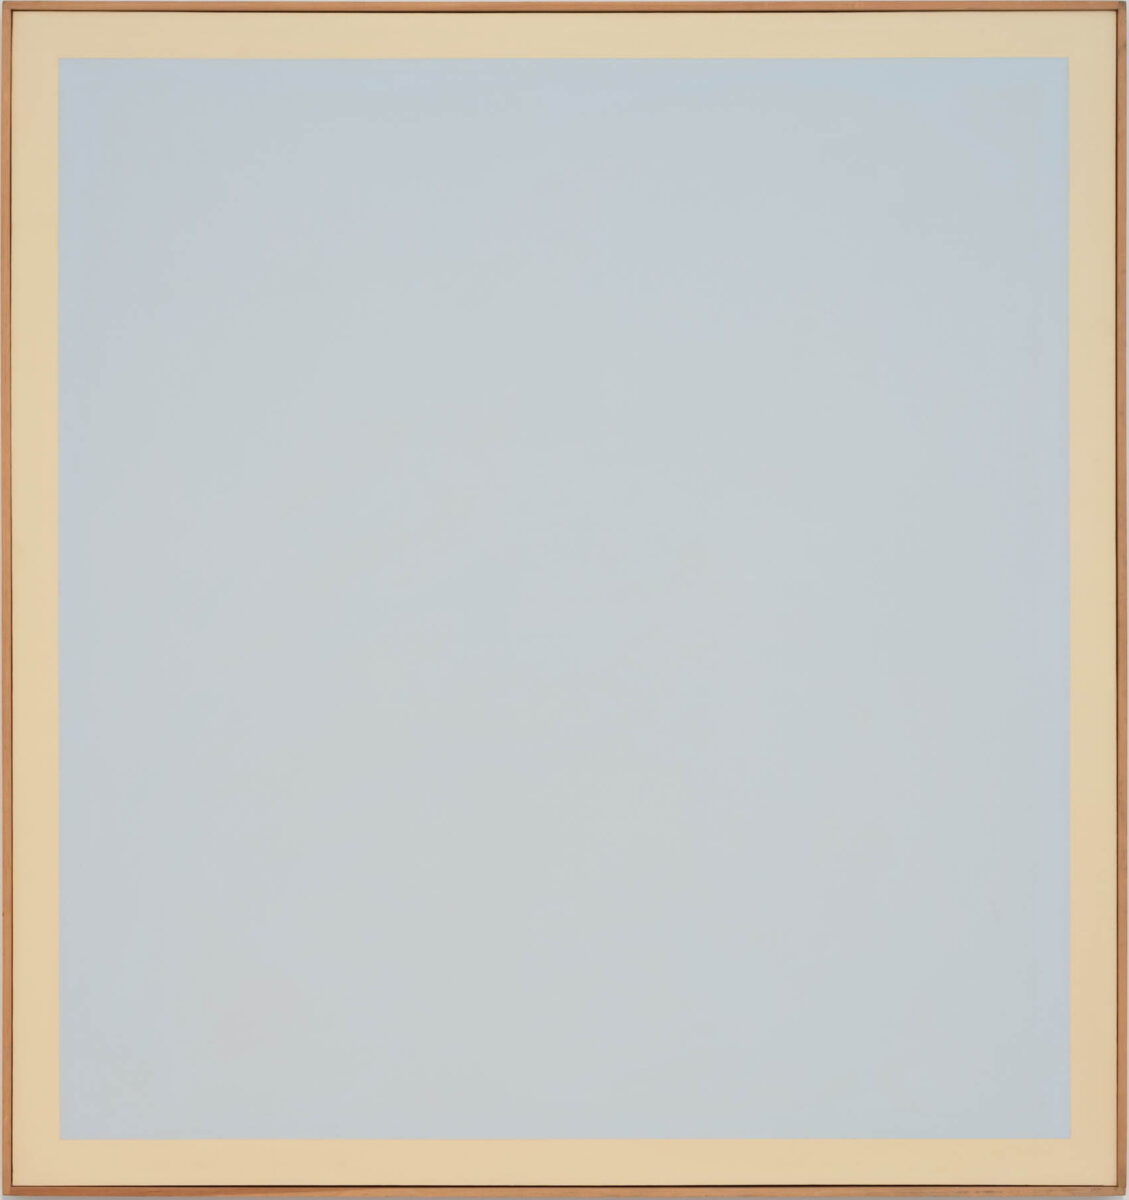 Walter Darby Sistene original alykd on canvas for sale